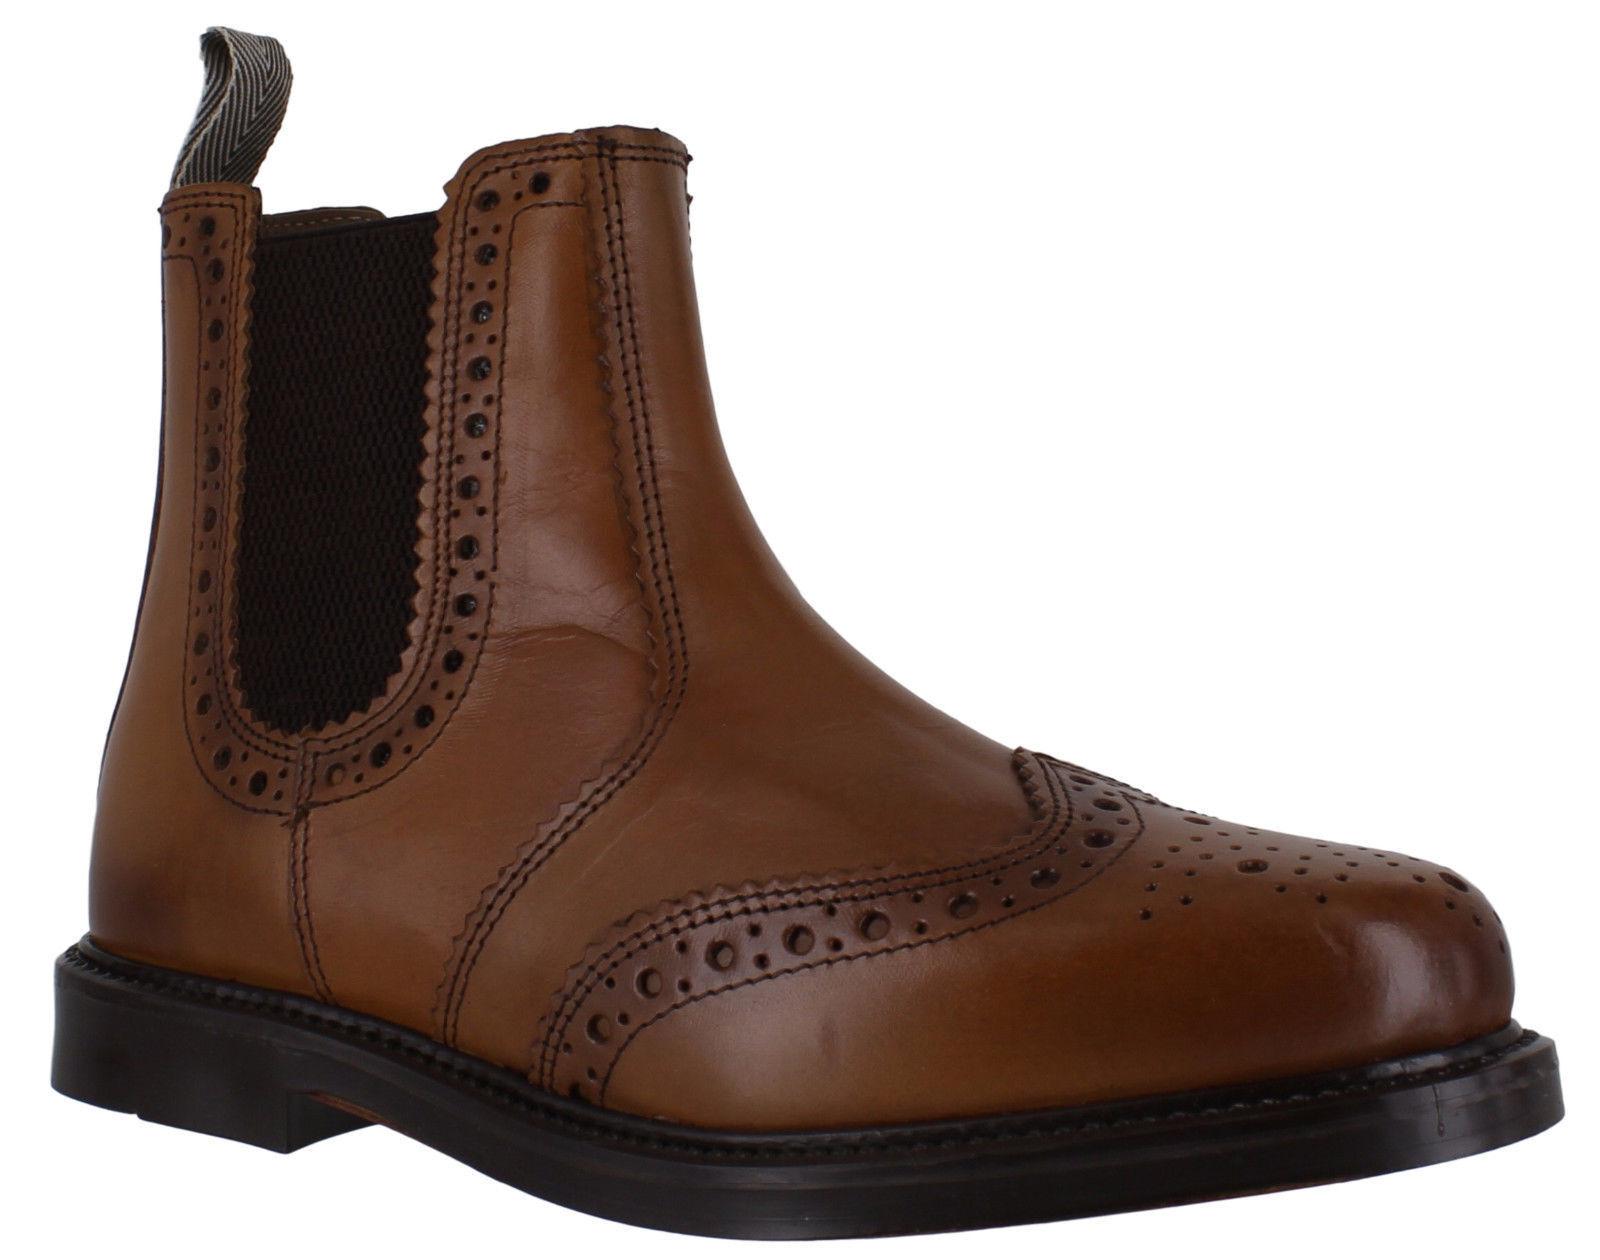 Catesby Herren zum hineinziehen Leder Flügelspitze Händler Chelsea Brogue Boots